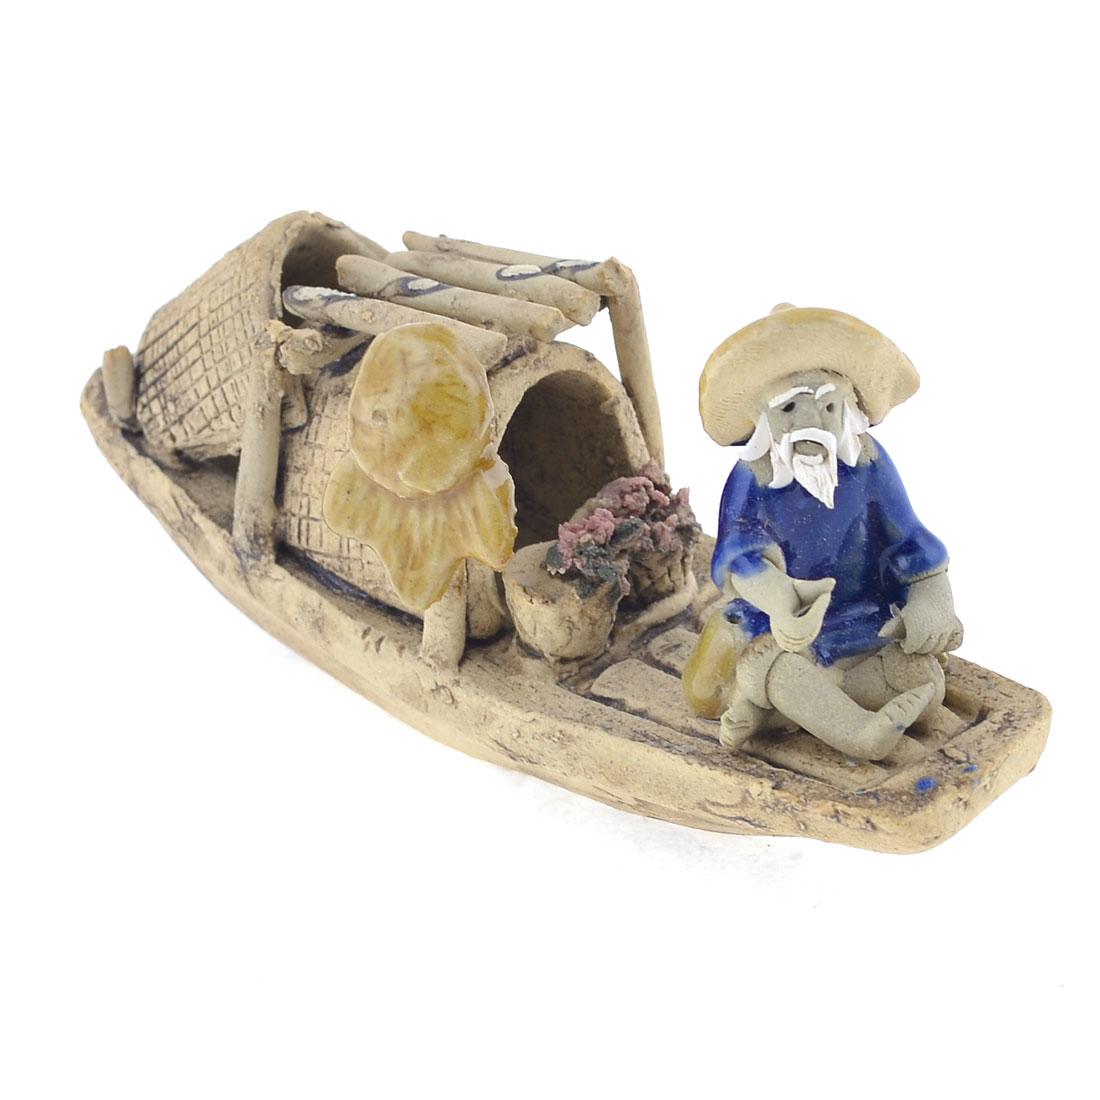 Handmade Fishman Fishboat Shaped 10cm Long Ceramic Craft Boat Decor